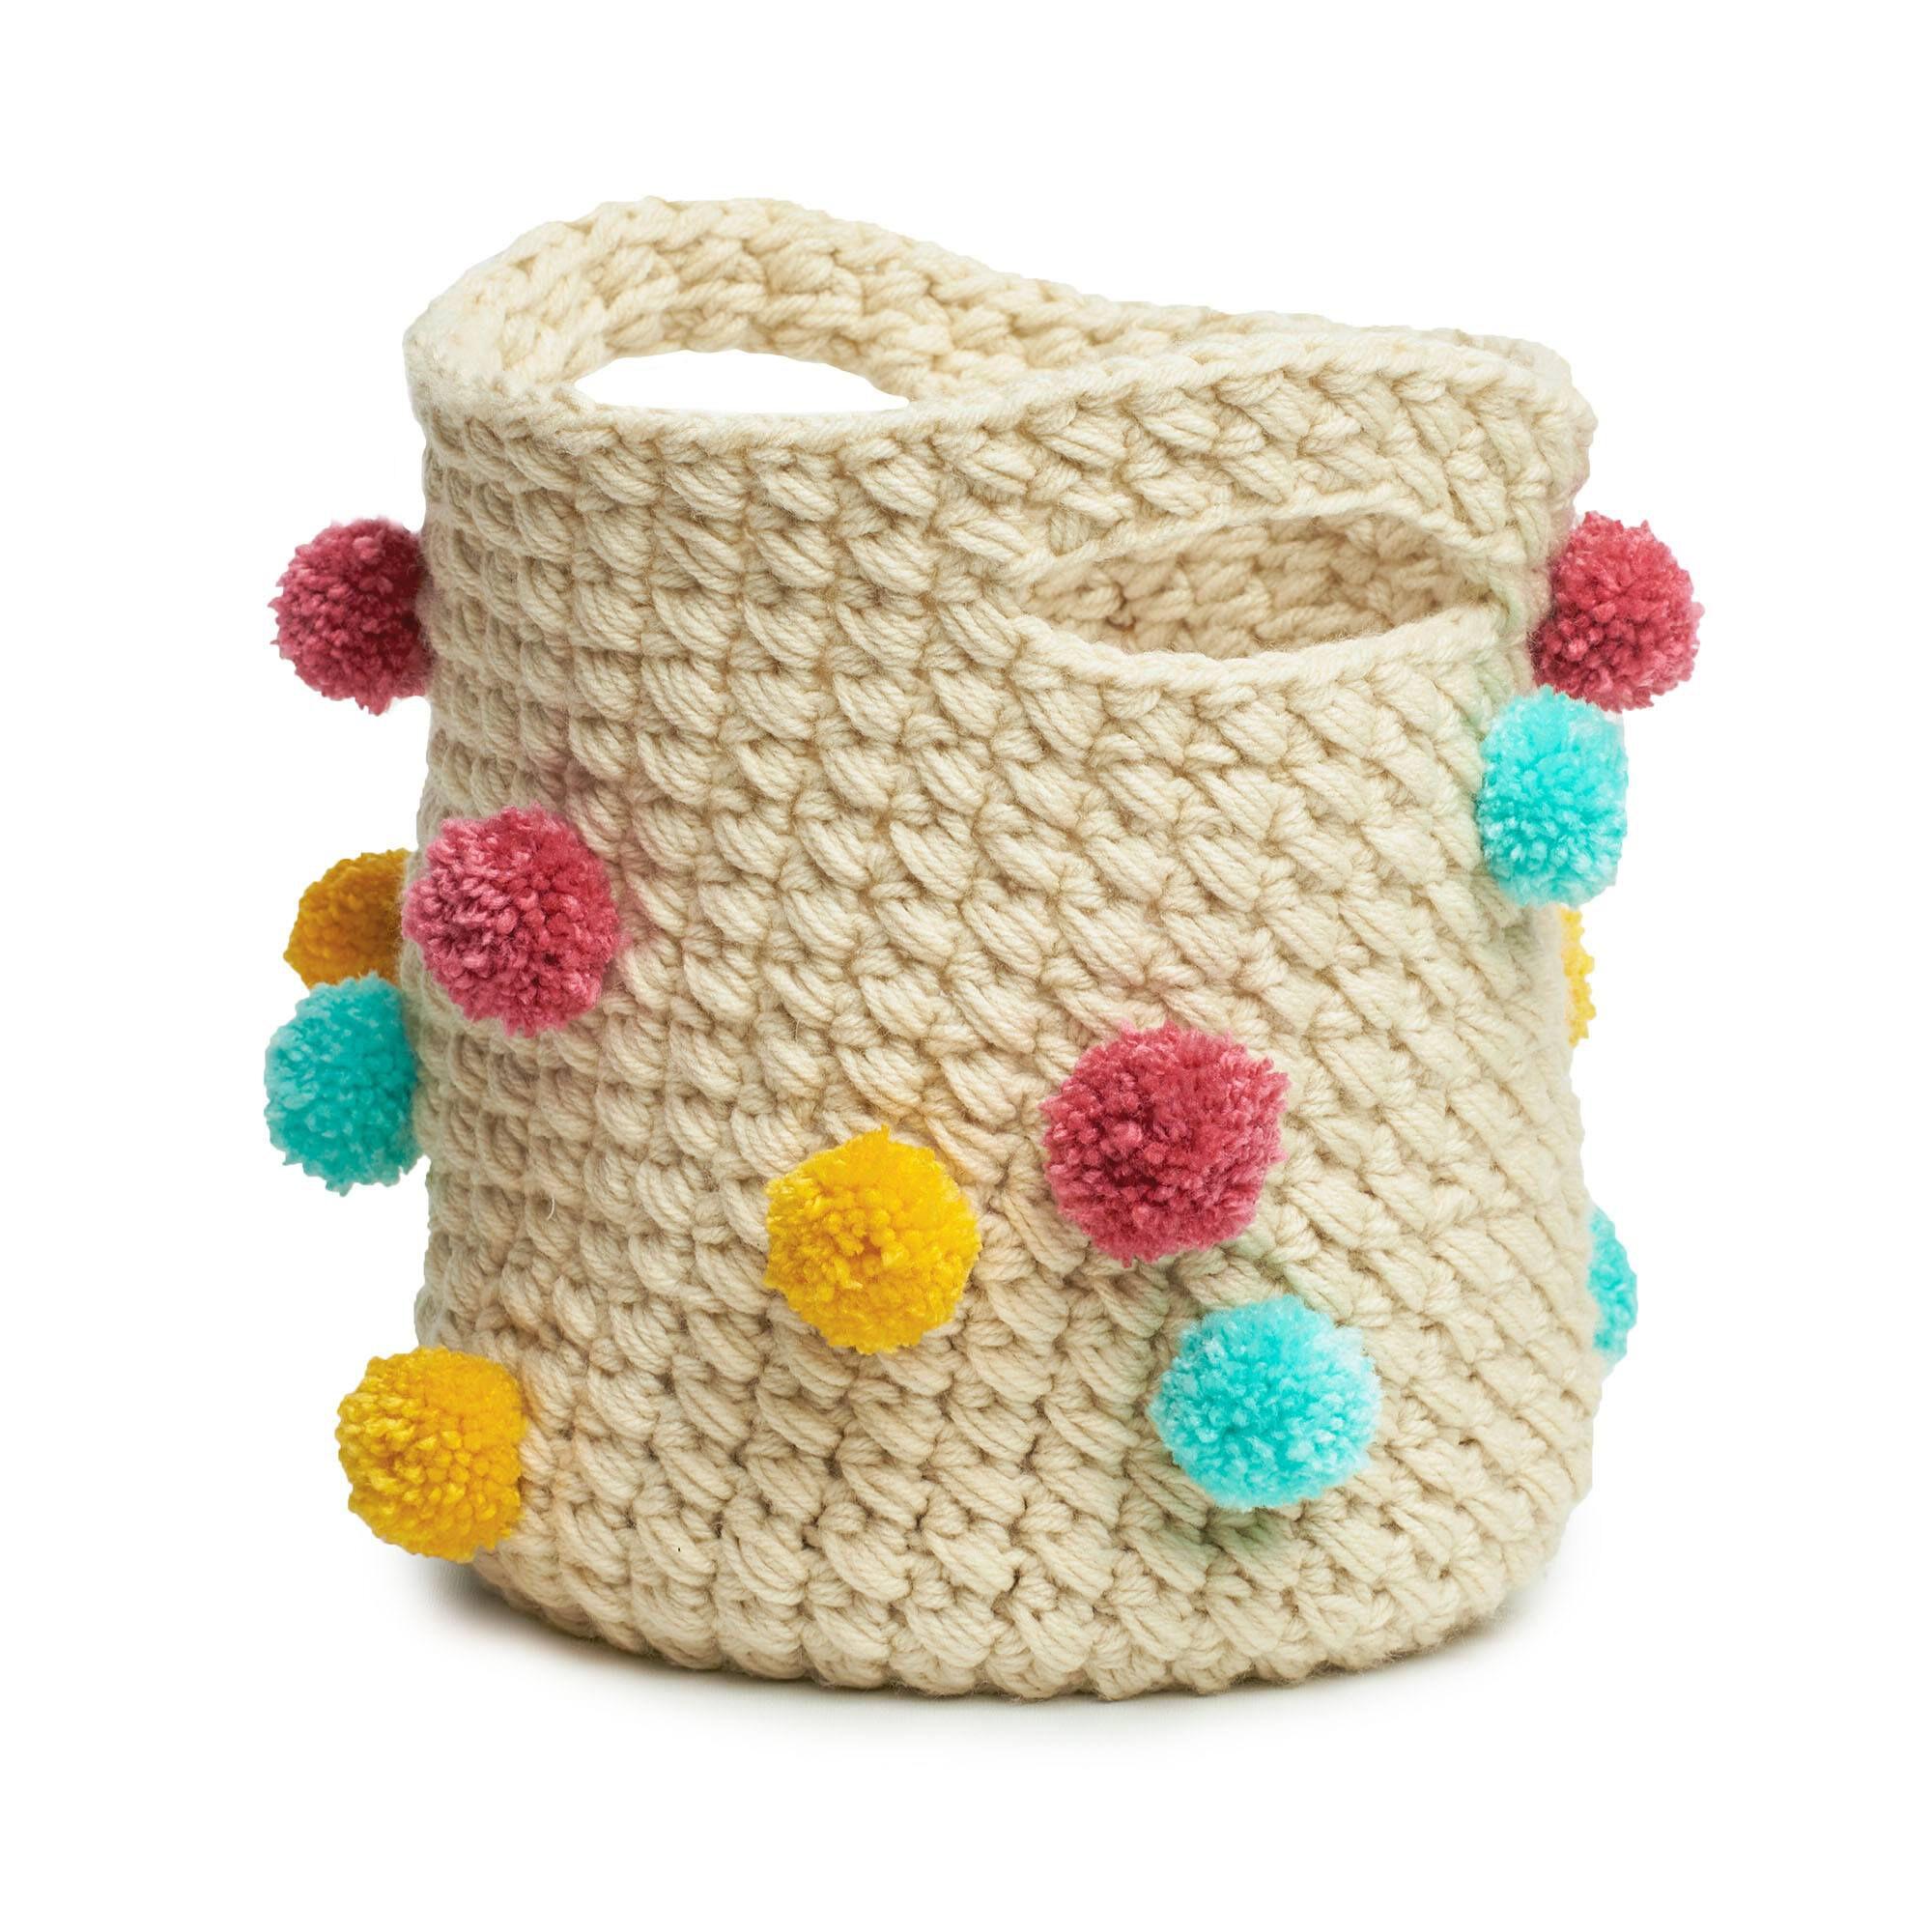 62-free-our-favorite-crochet-storage-basket-free-ideas-new-2019